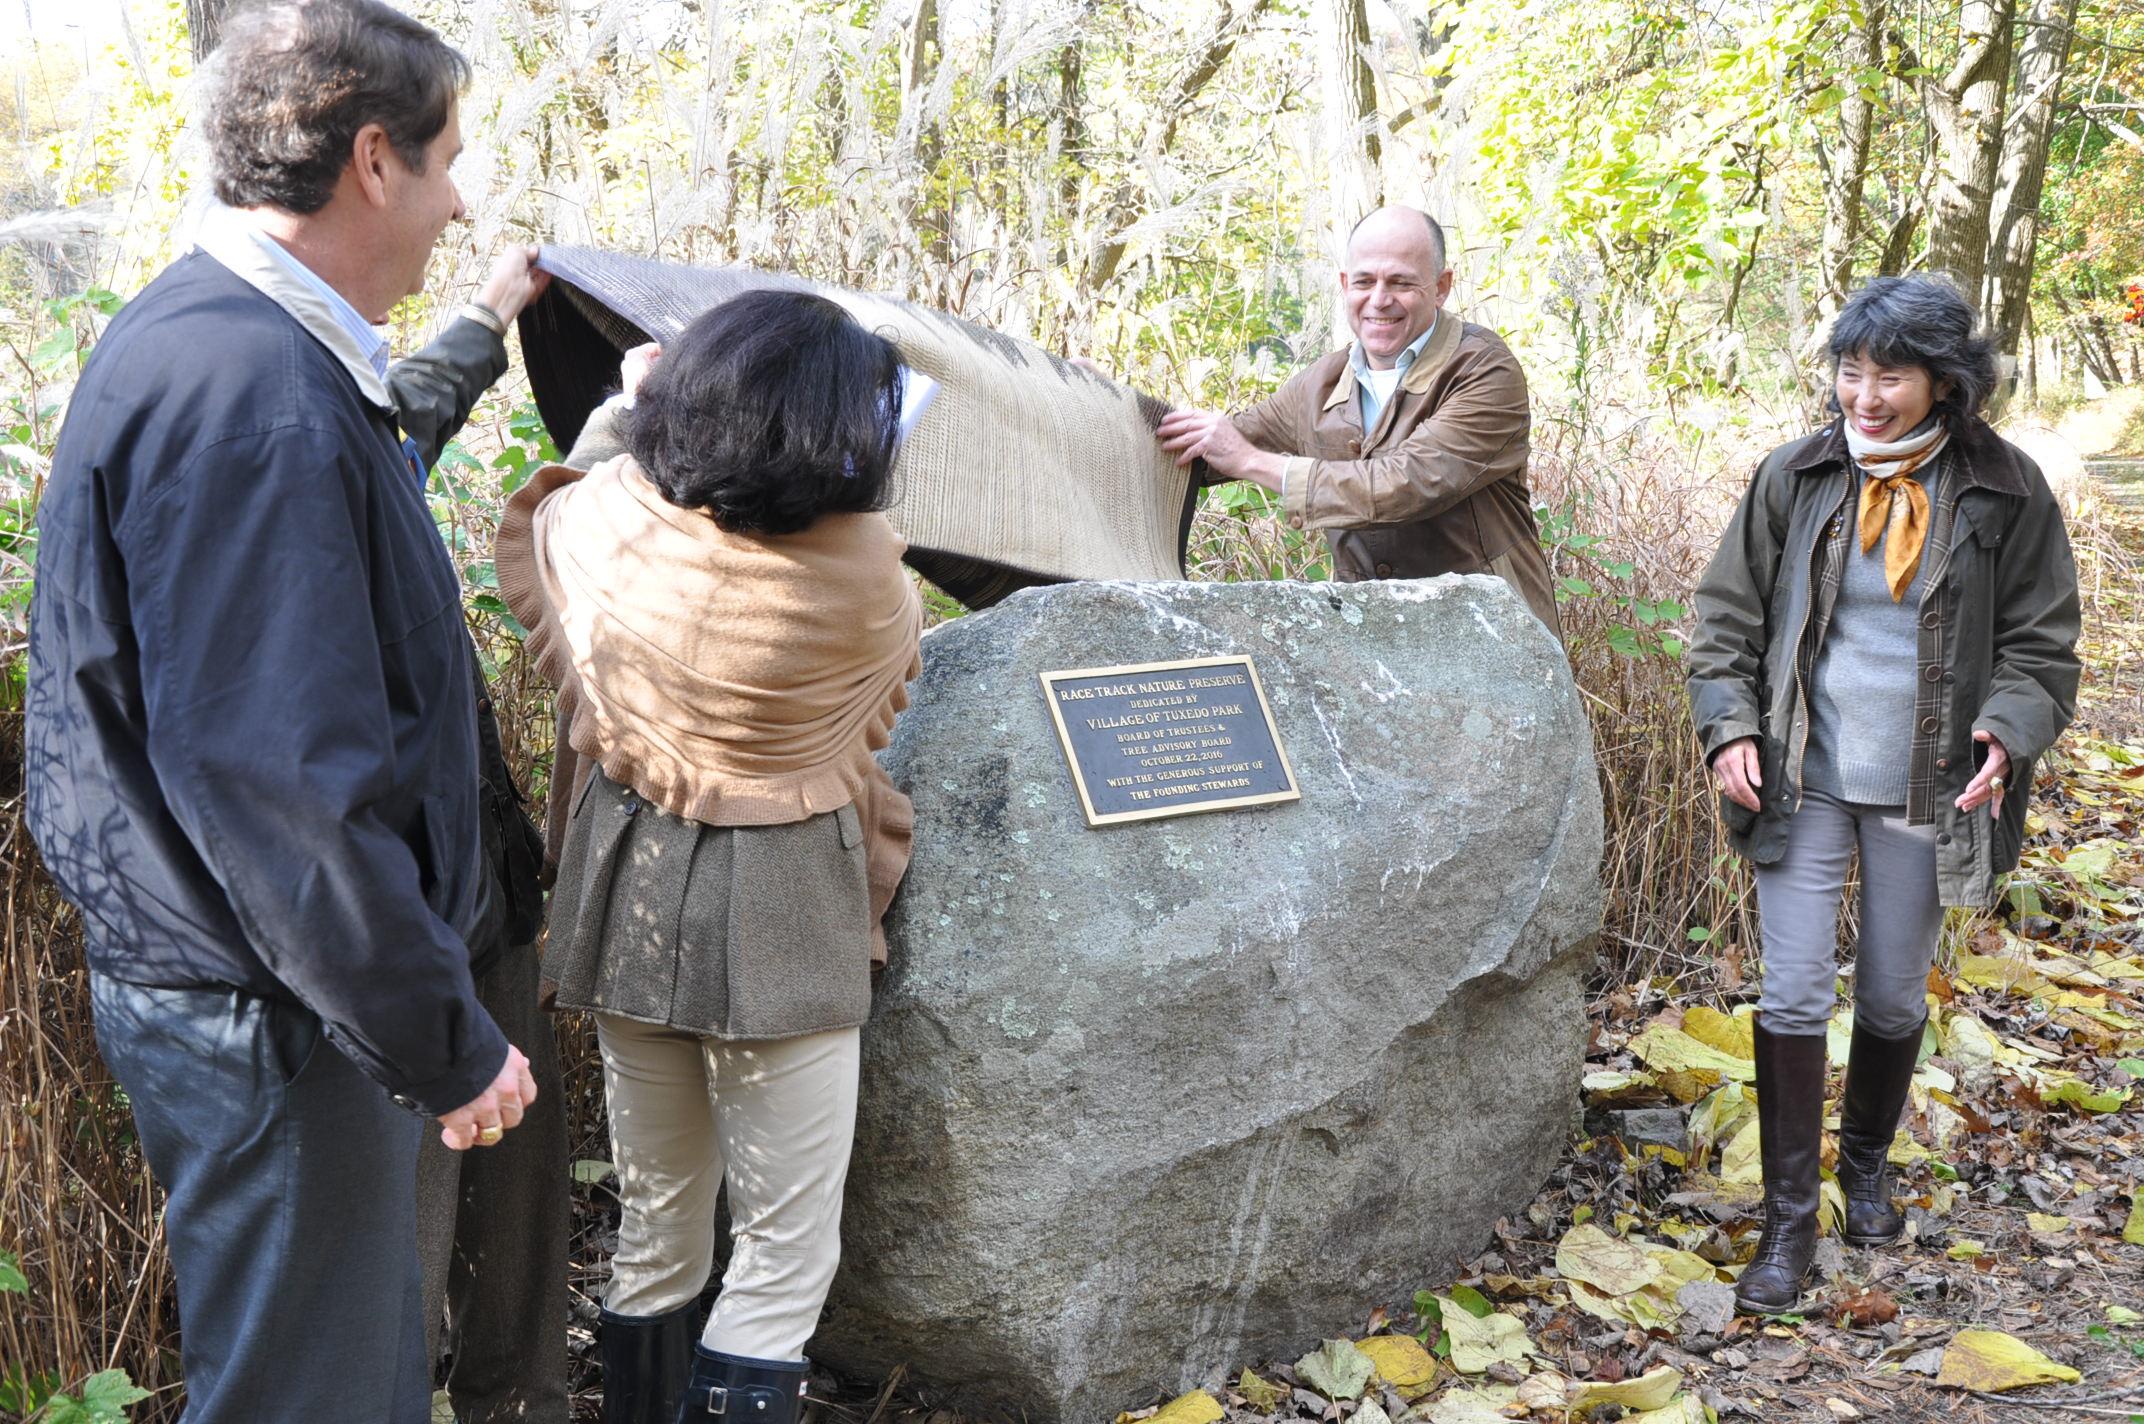 Unveiling the Dedication plaque.